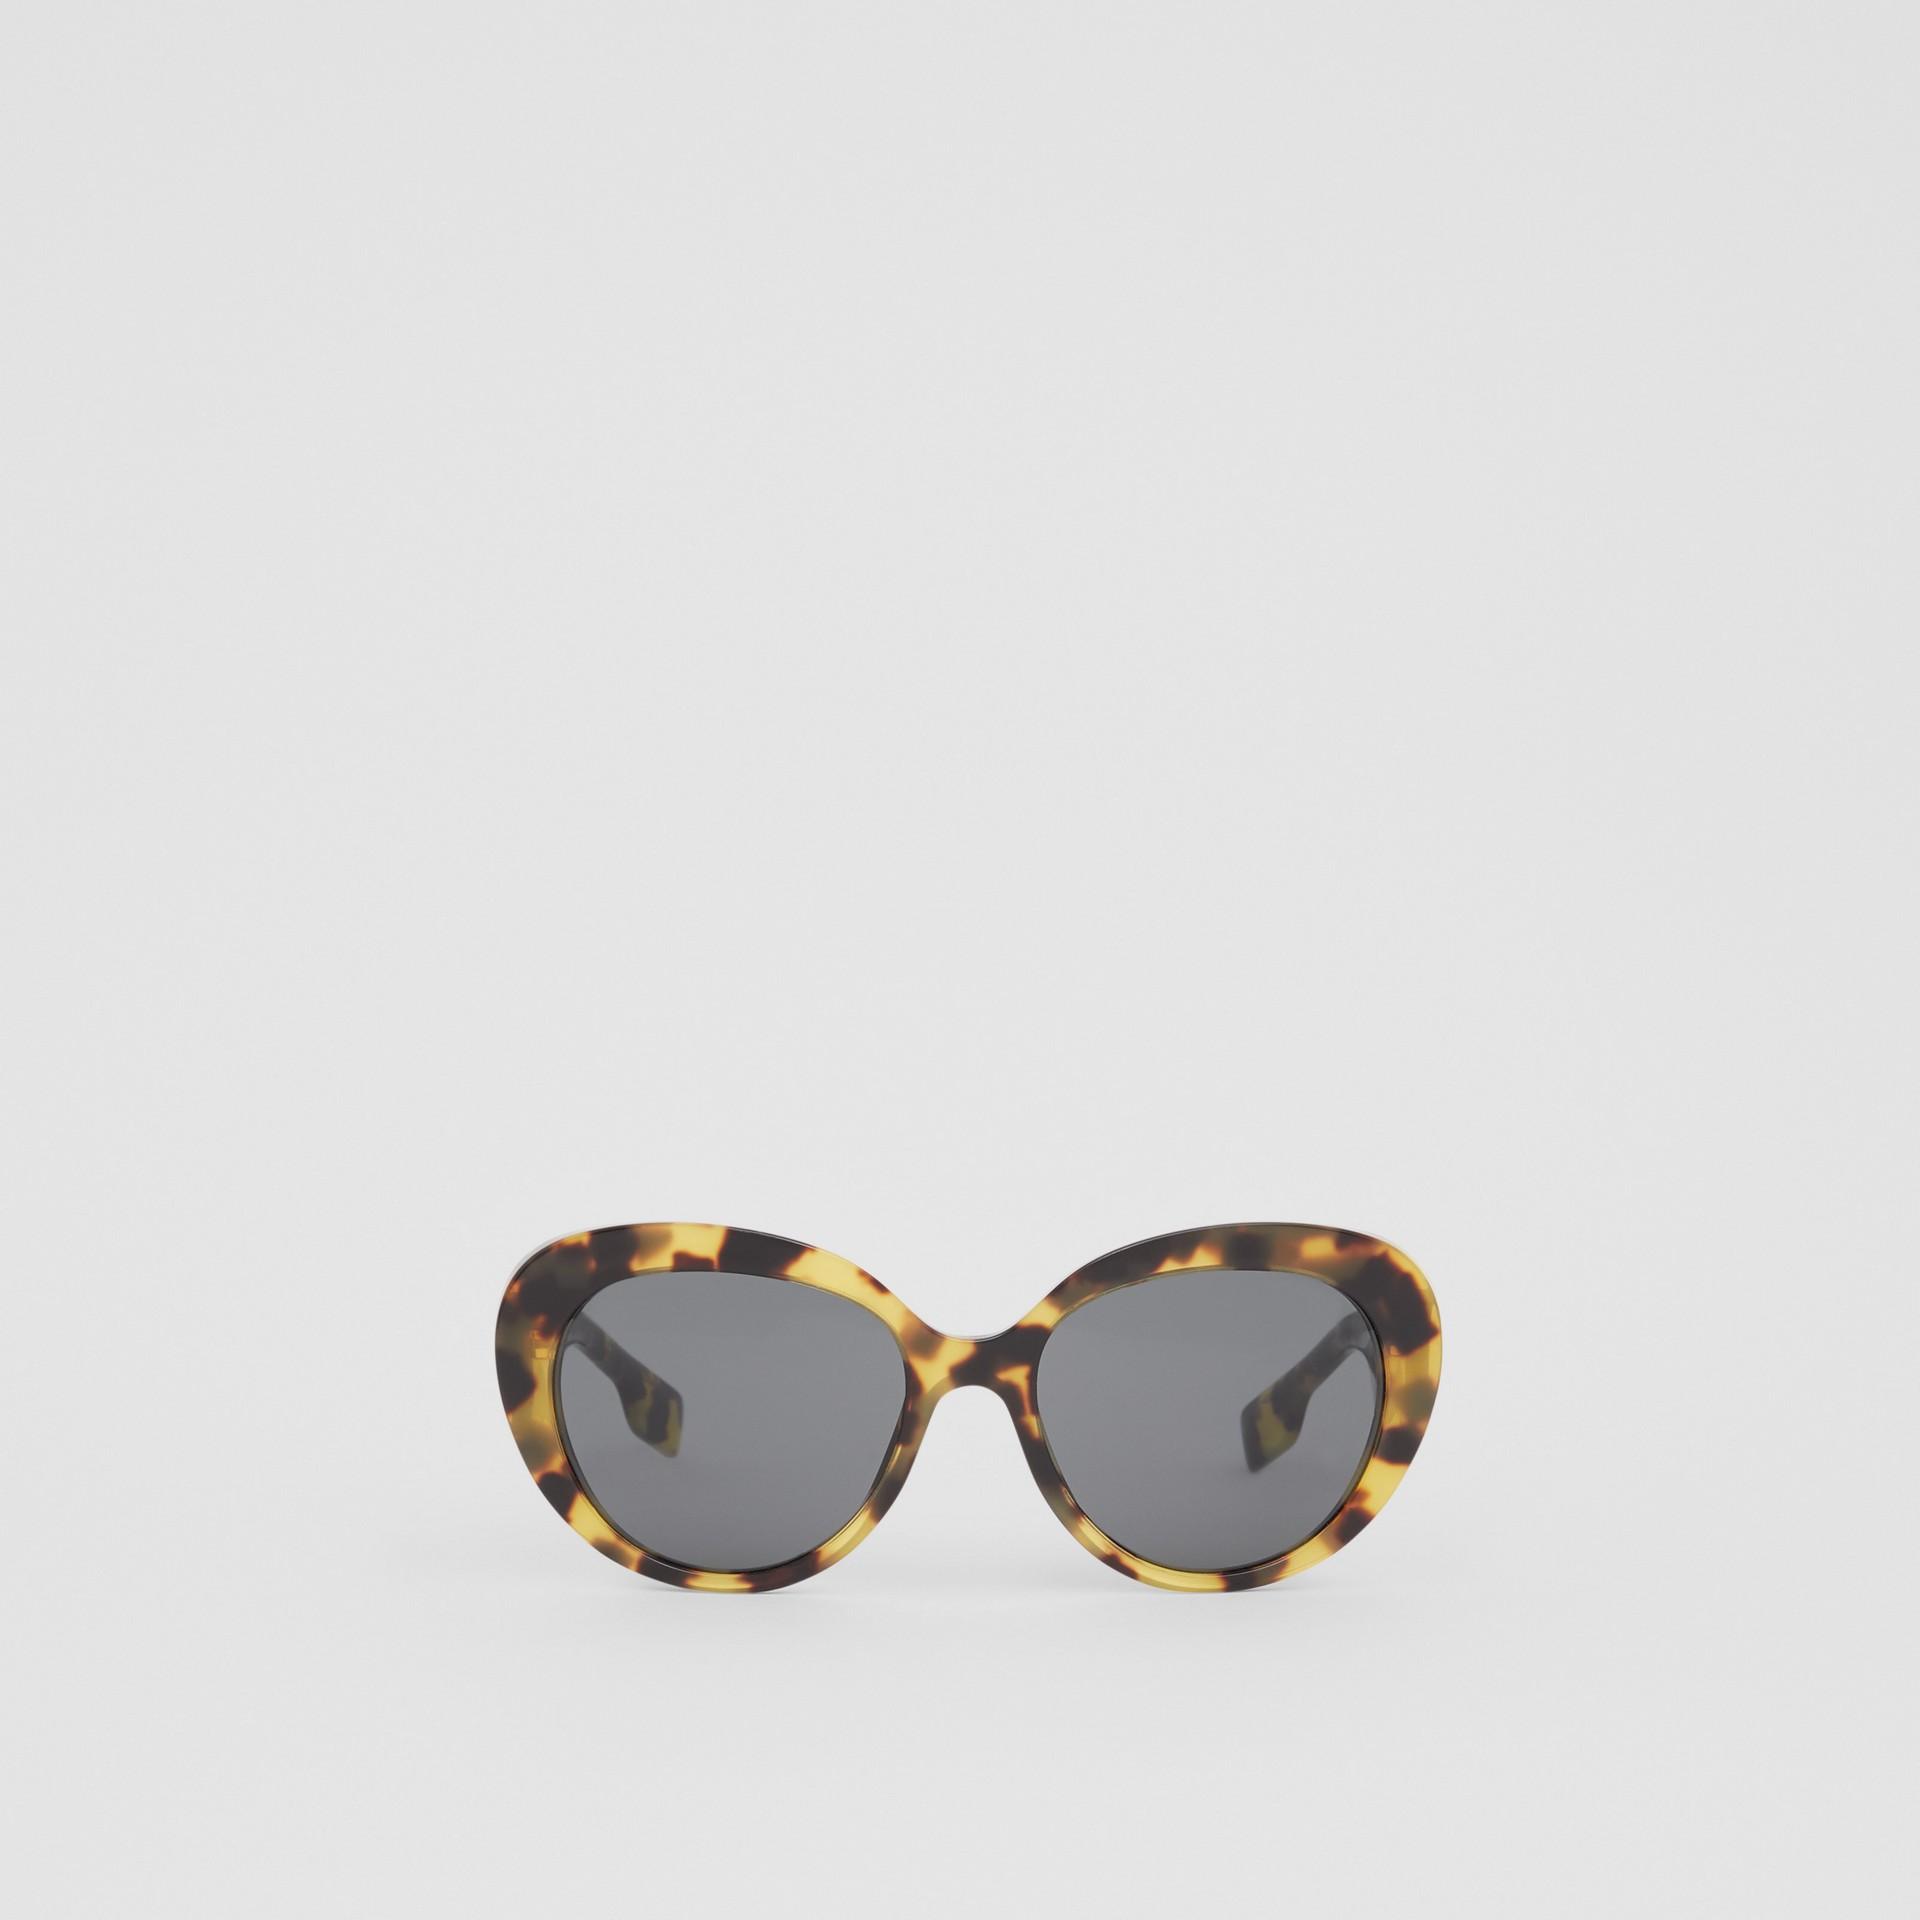 Monogram Motif Cat-eye Frame Sunglasses in Bright Tortoiseshell - Women | Burberry - gallery image 0